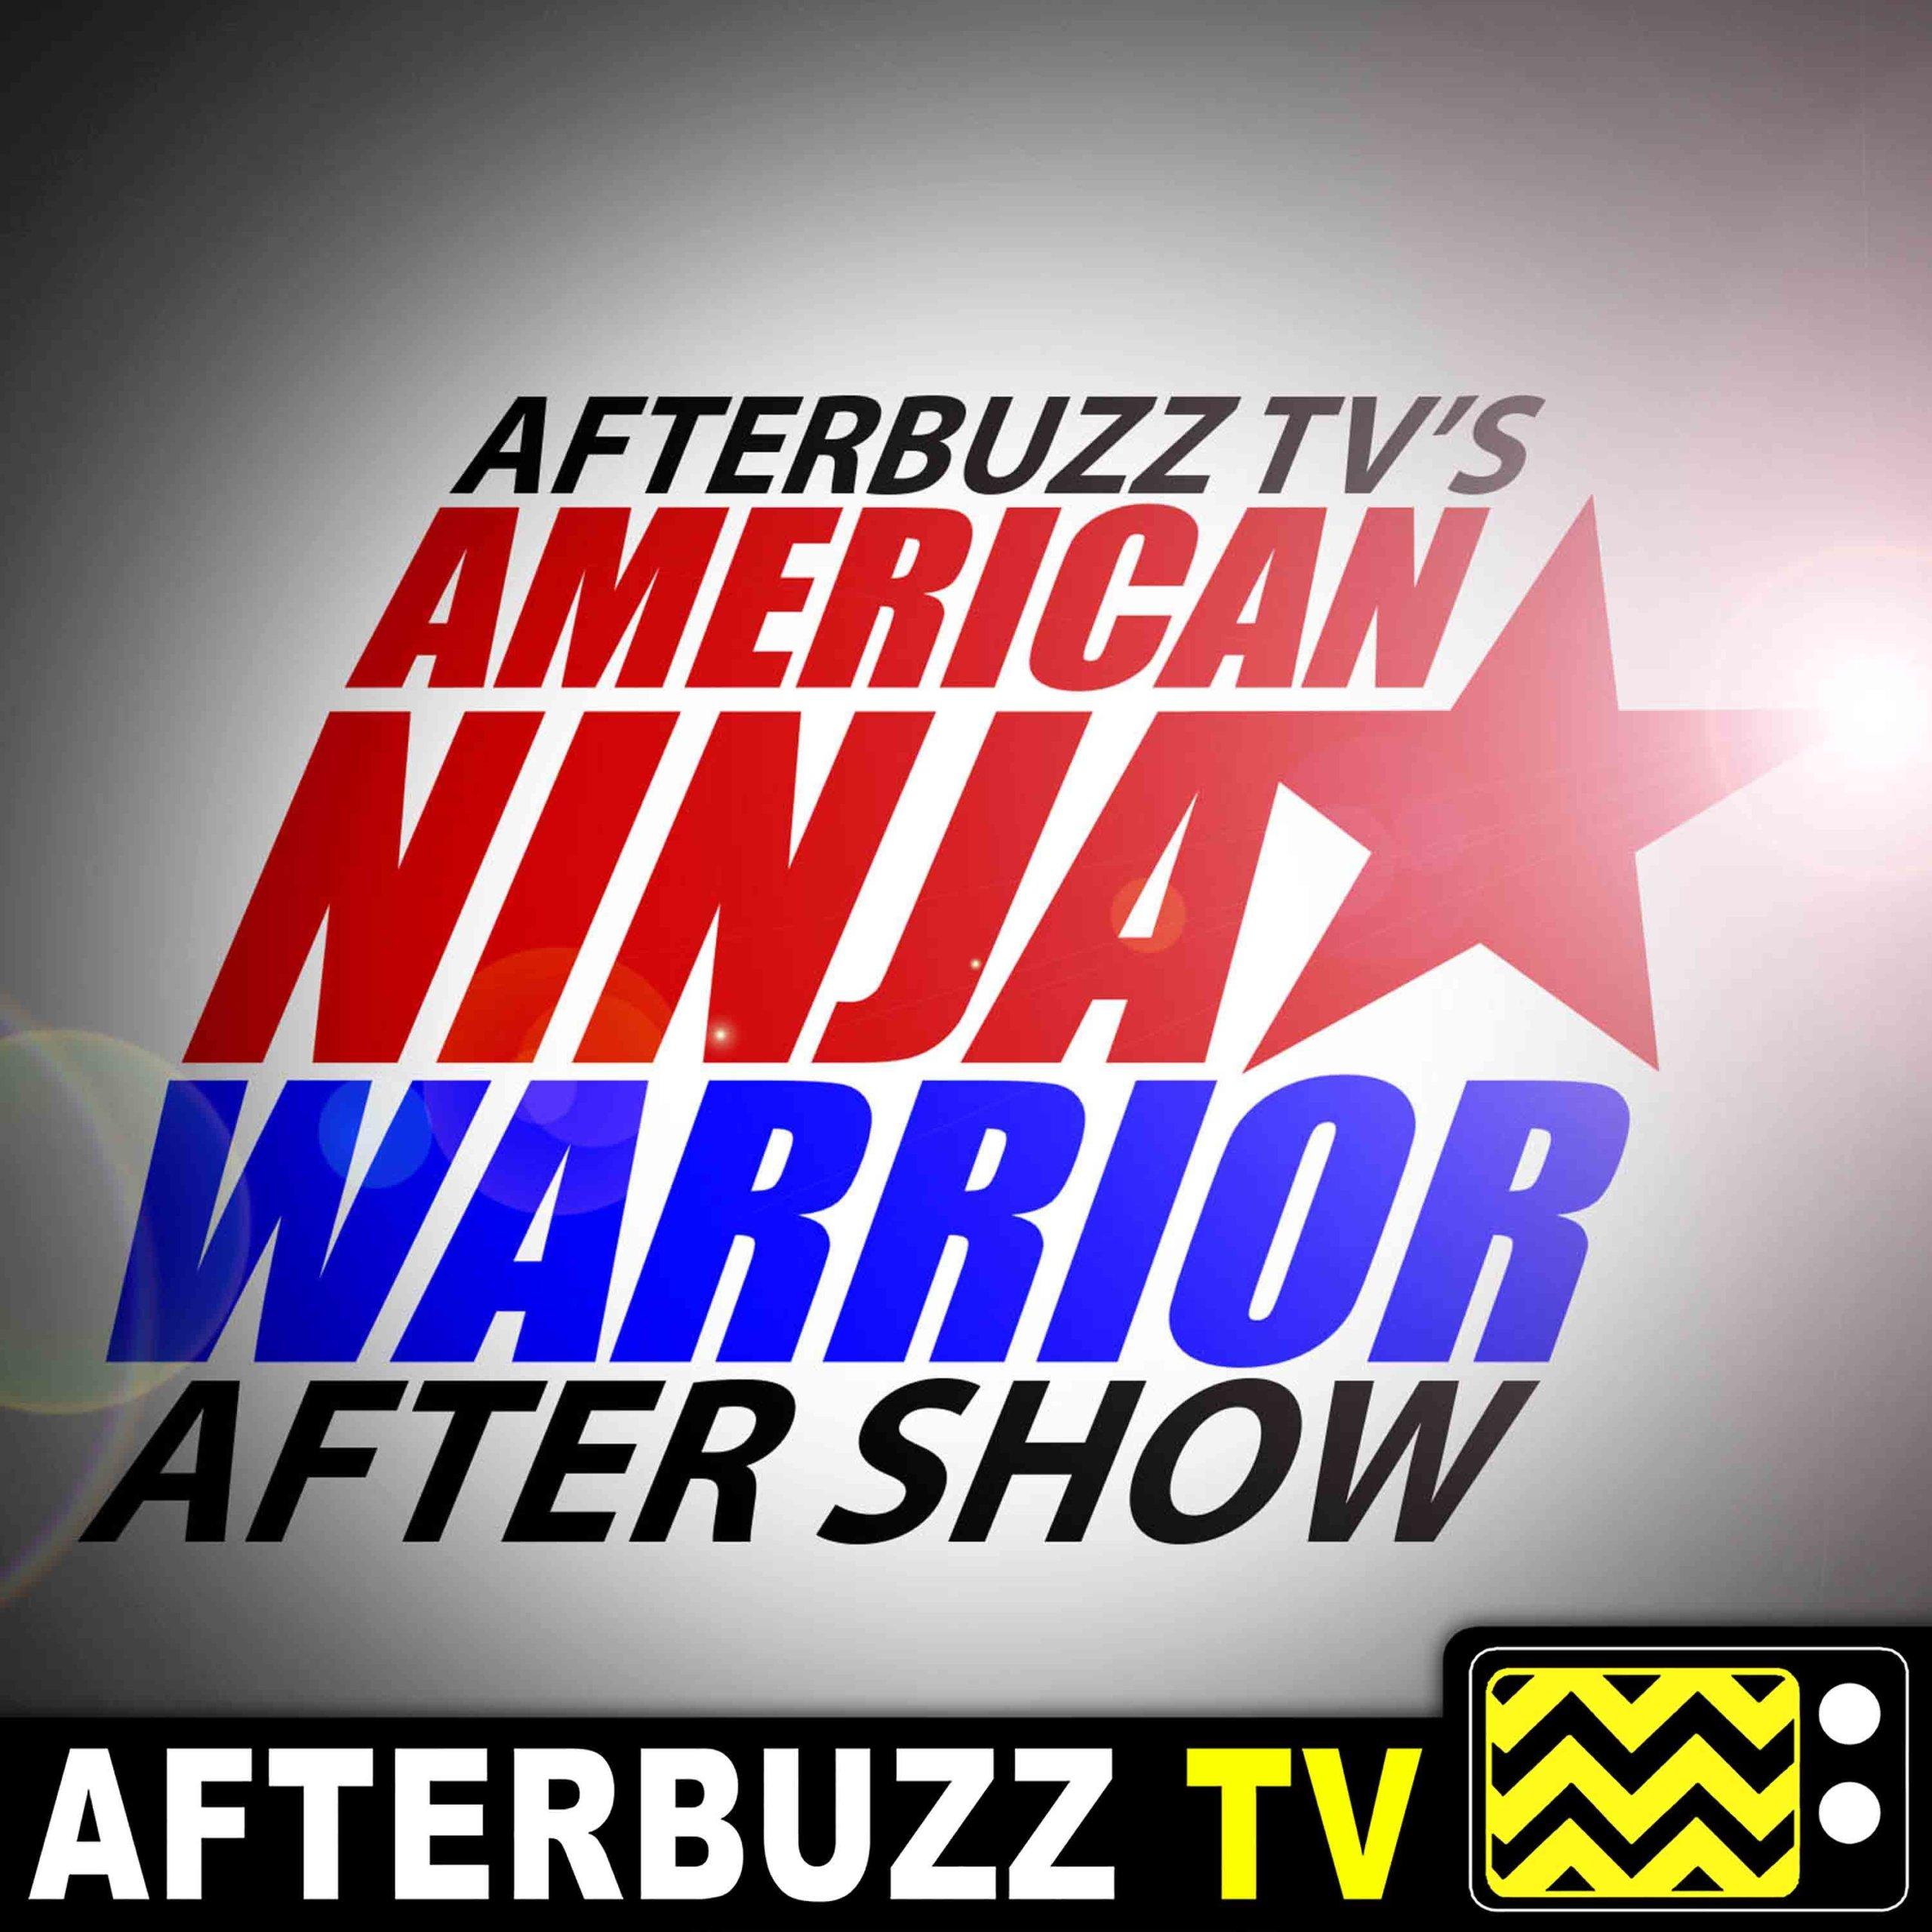 American Ninja Warrior S:9 | Las Vegas Season Finale E:15 | AfterBuzz TV AfterShow